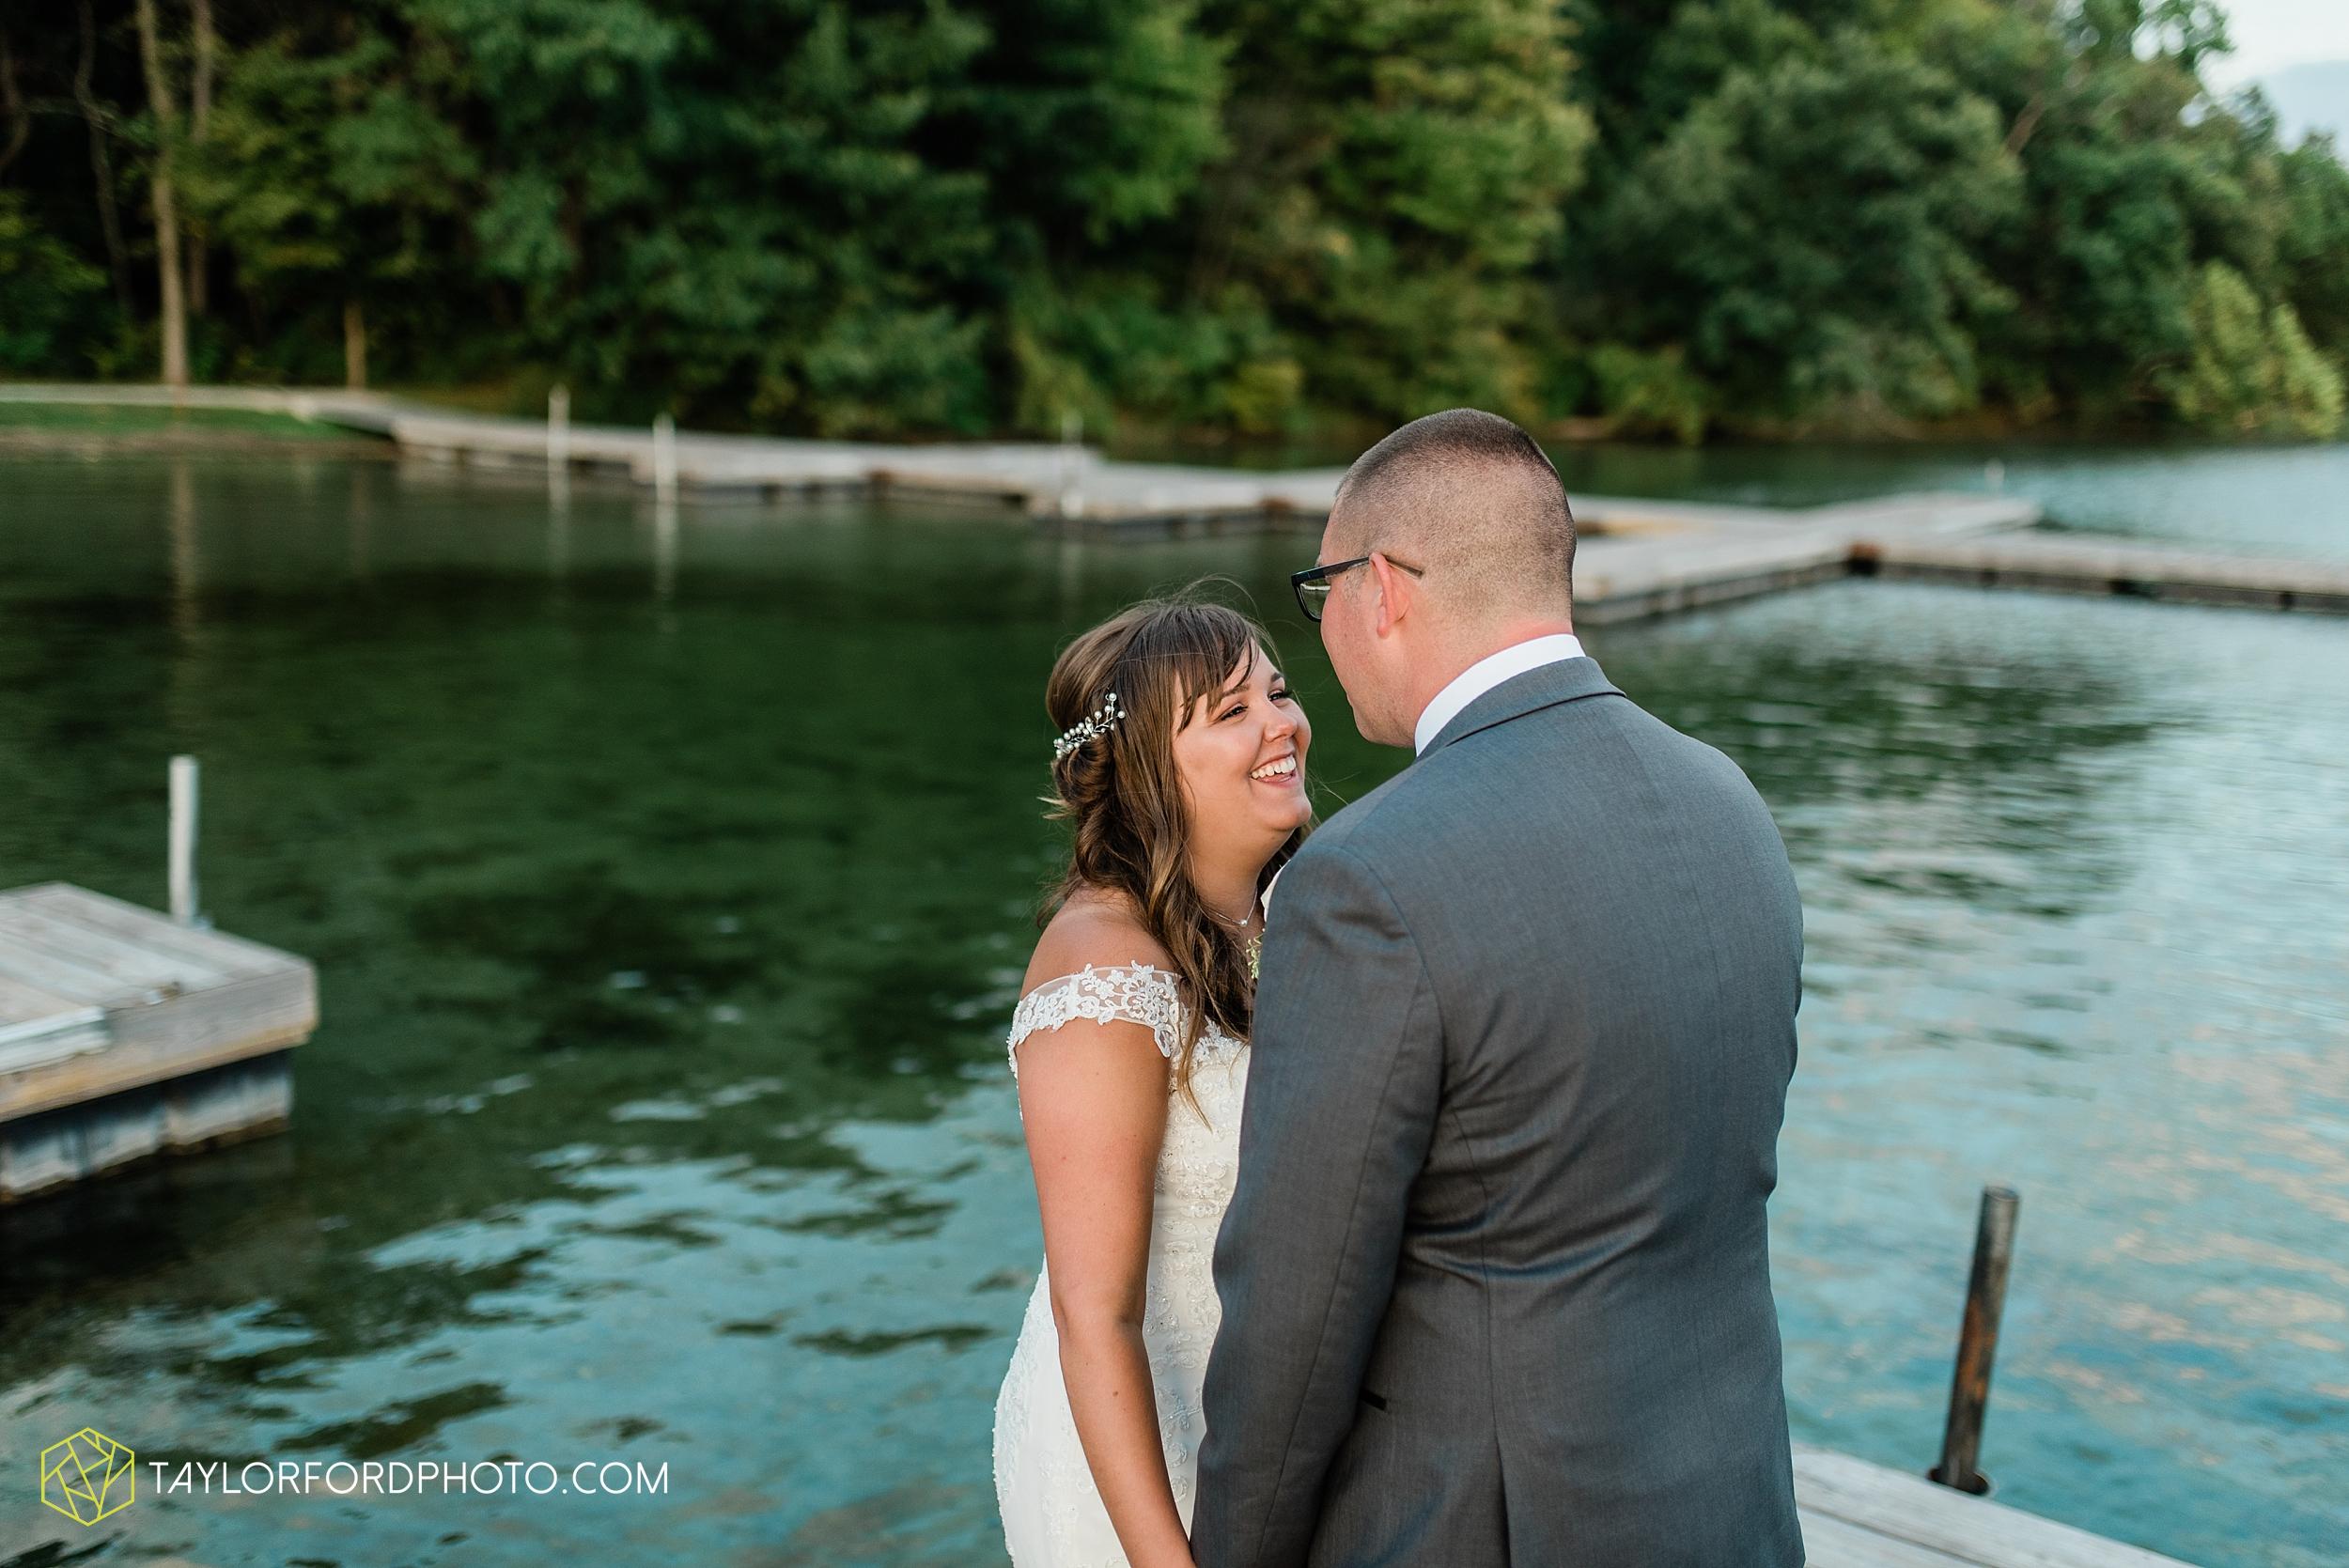 brook-loren-pokagon-state-park-angola-indiana-potowatomi-inn-wedding-fall-lake-james-photographer-taylor-ford-photography_0563.jpg